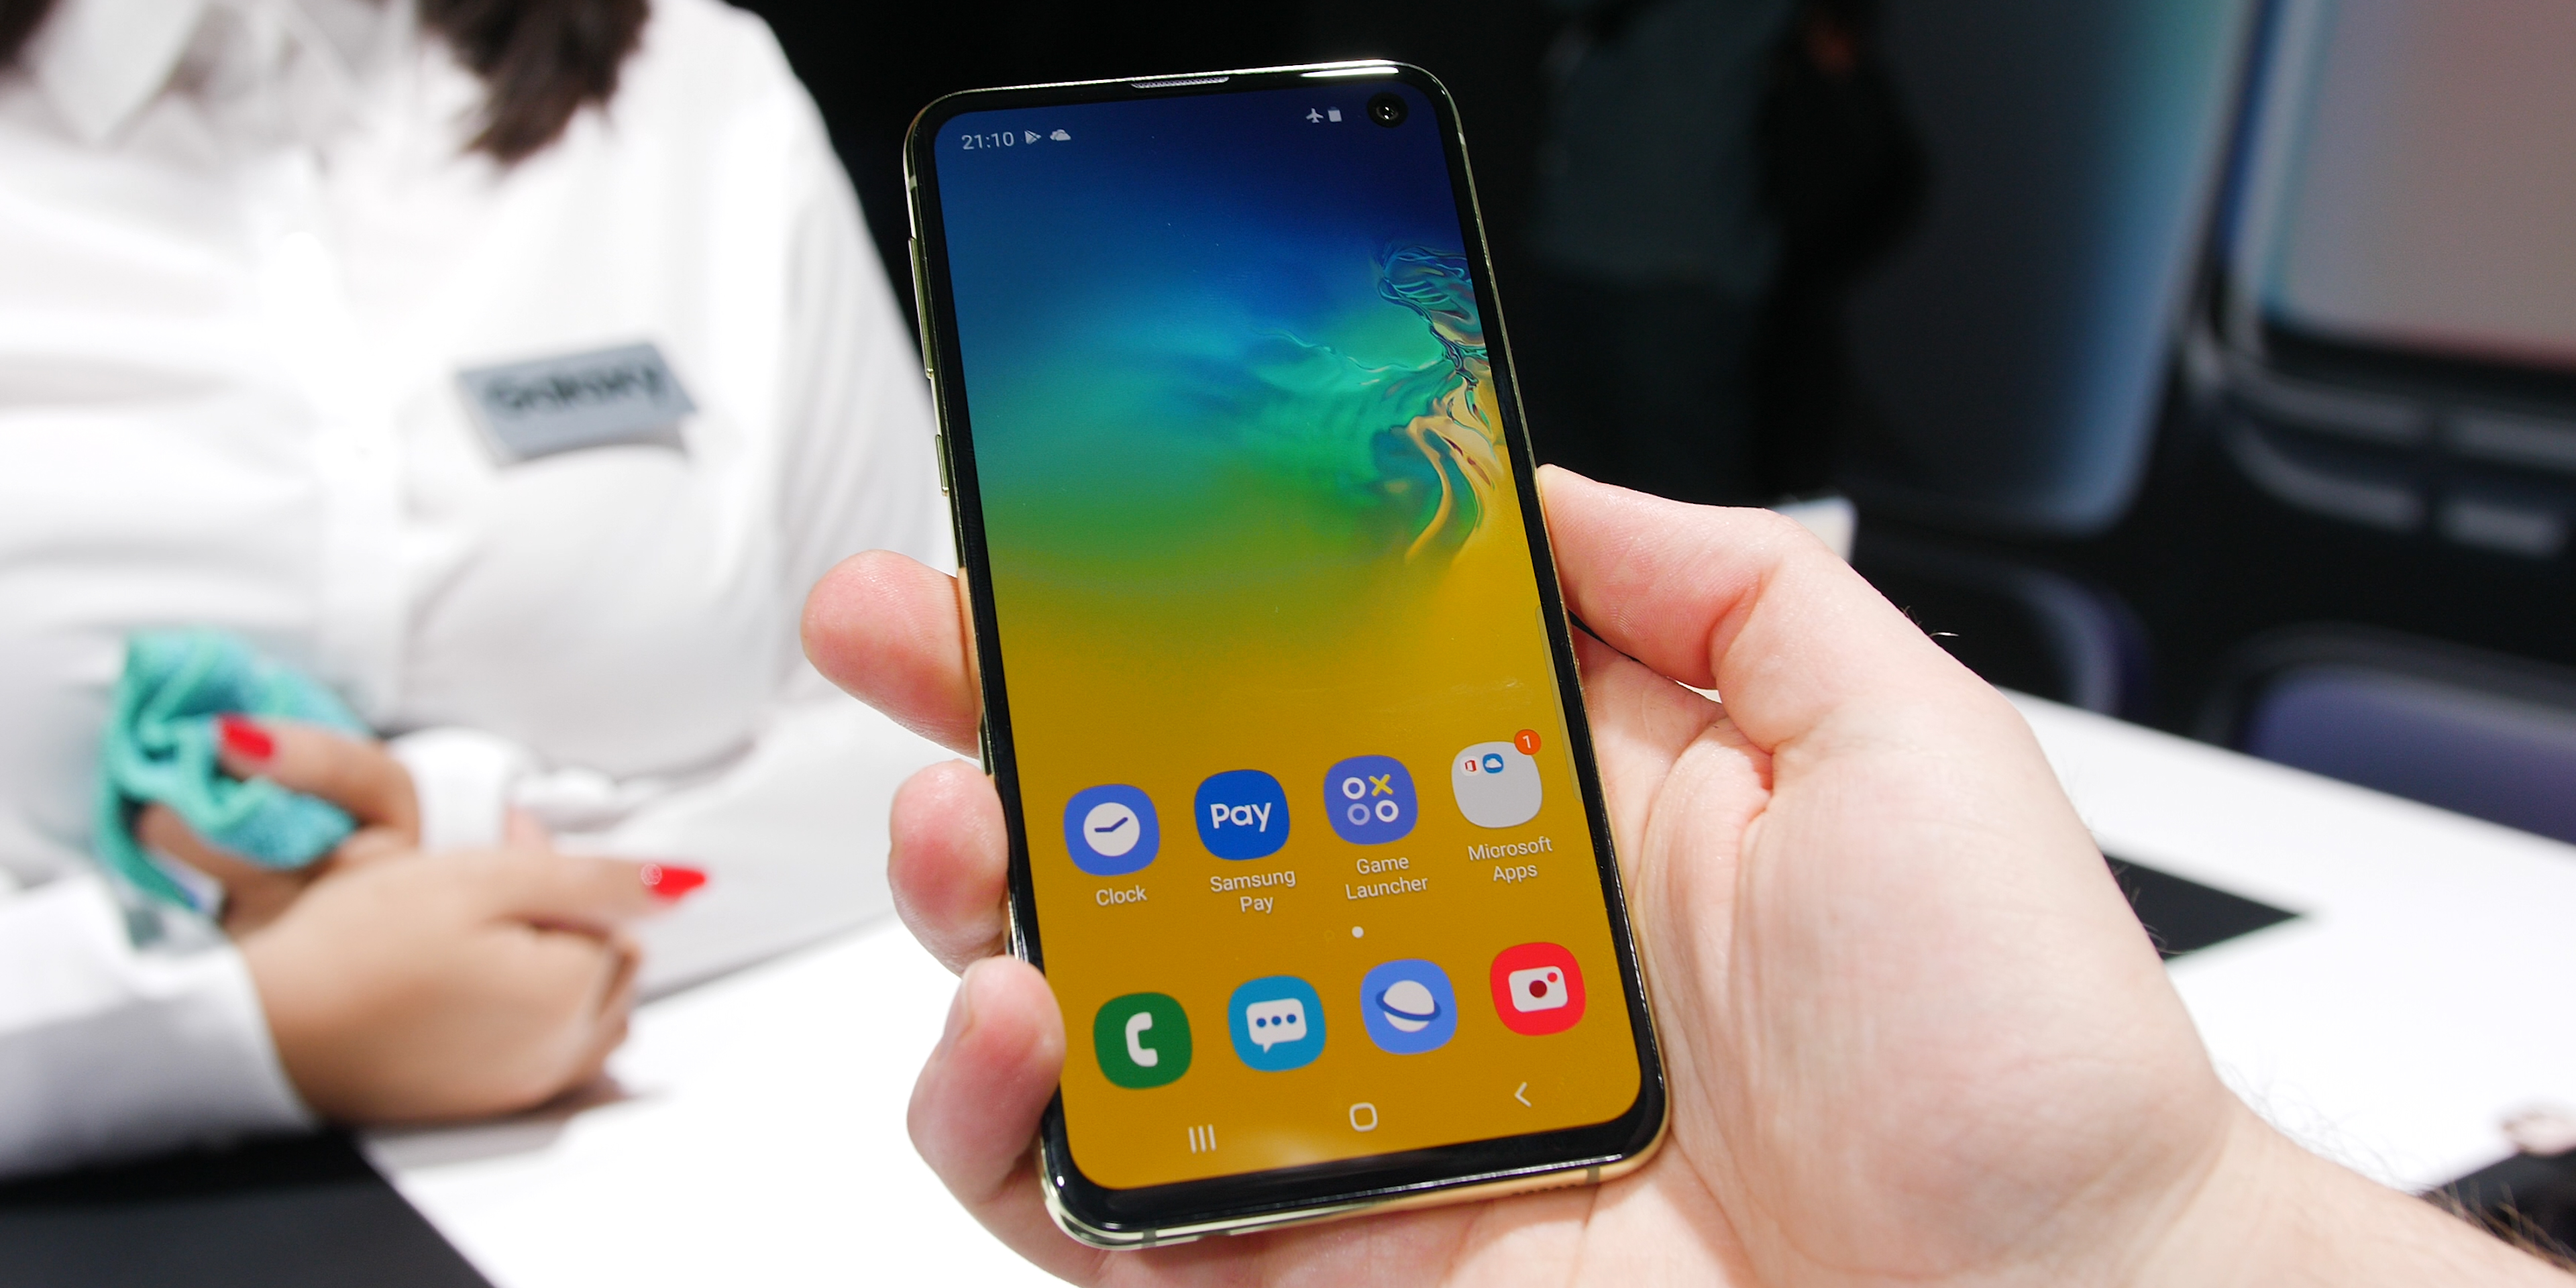 Samsung Galaxy S10e software